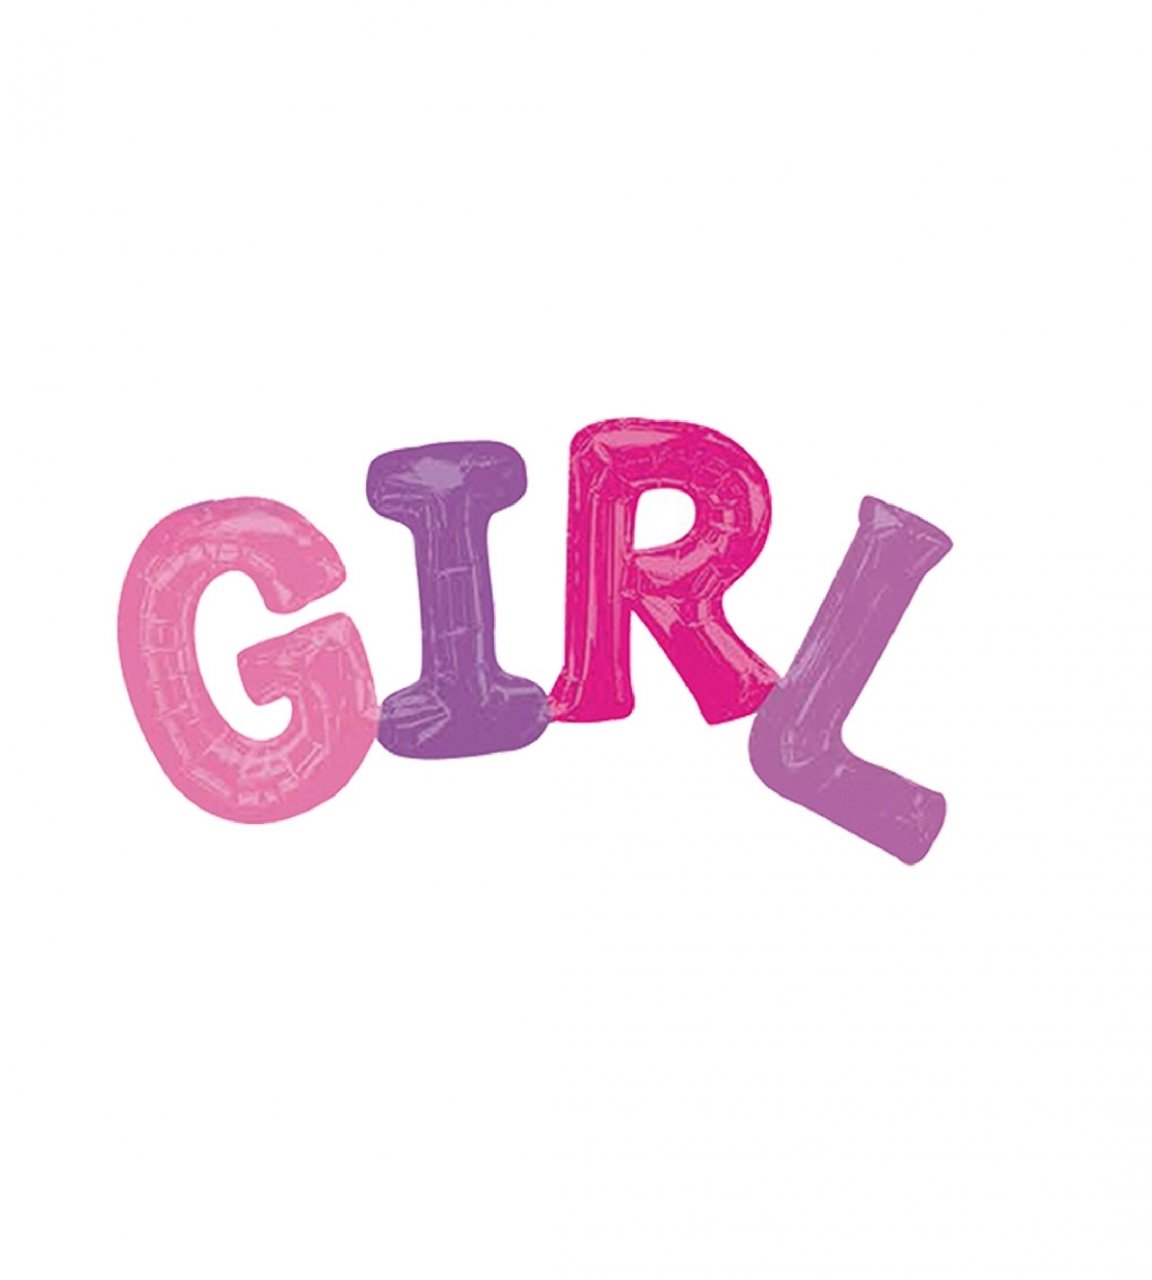 بادکنک فویلی GIRL (حروف دختر)